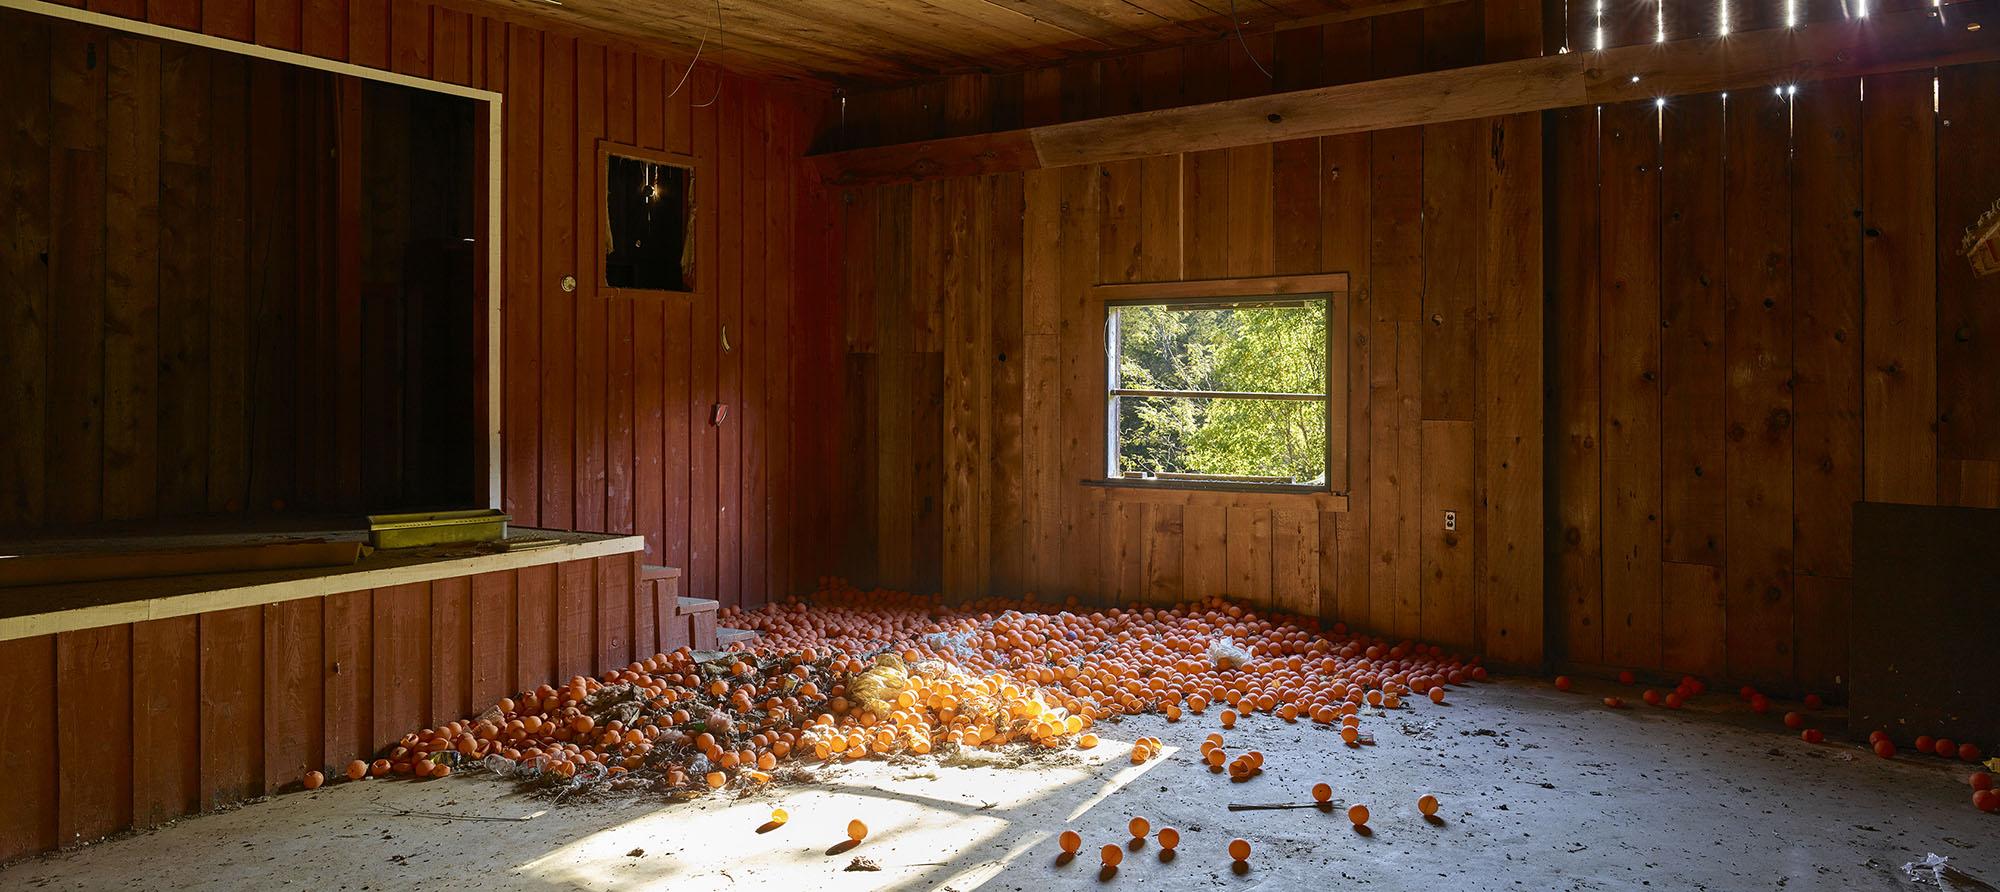 Dogpatch, Arkansas, USA. October 2016 SMALL.jpg